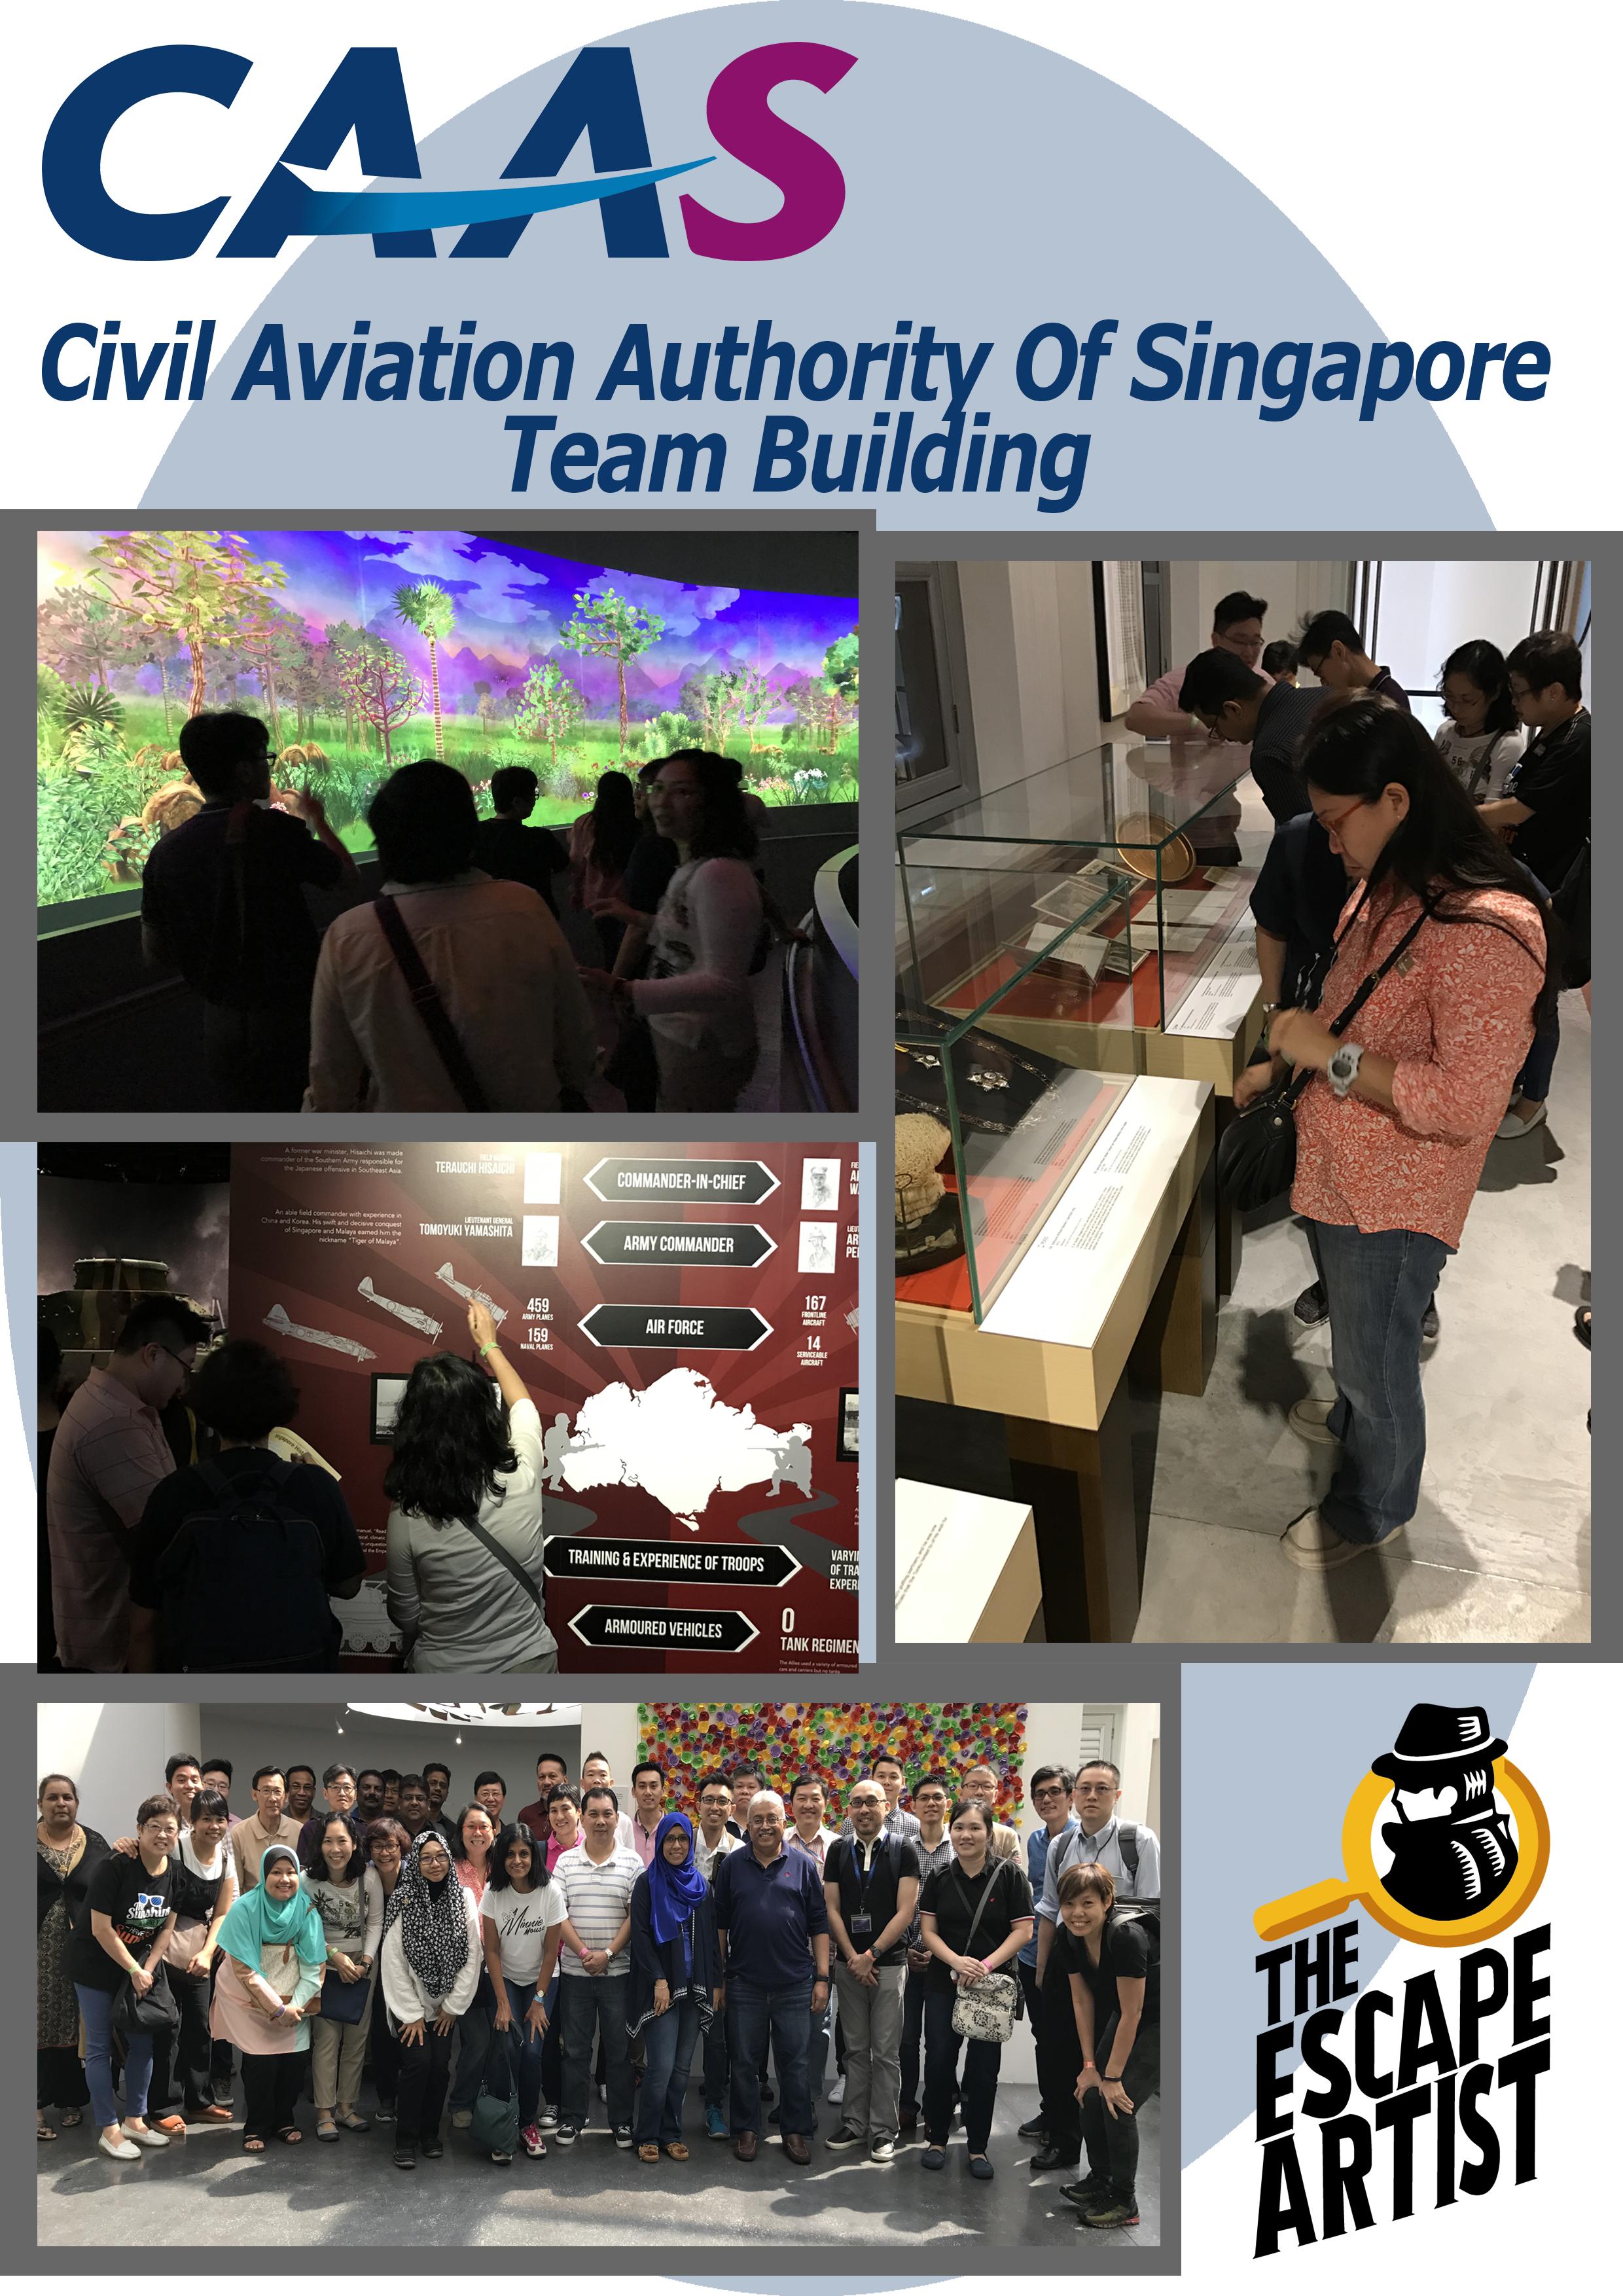 Indoor Corporate Room Escape Team Building Activities Singapore